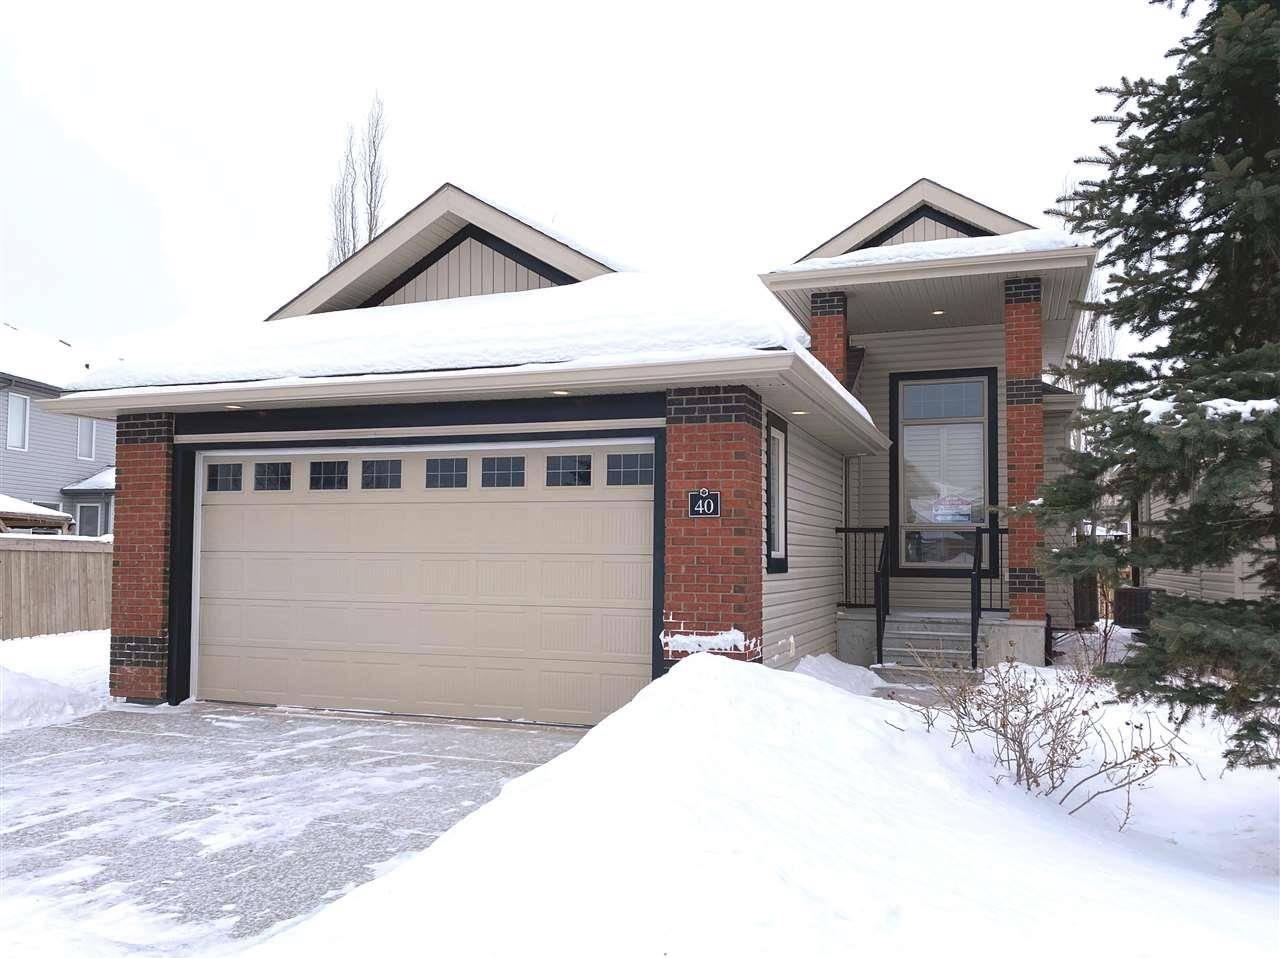 House for sale at 841 156 St Nw Unit 40 Edmonton Alberta - MLS: E4183499